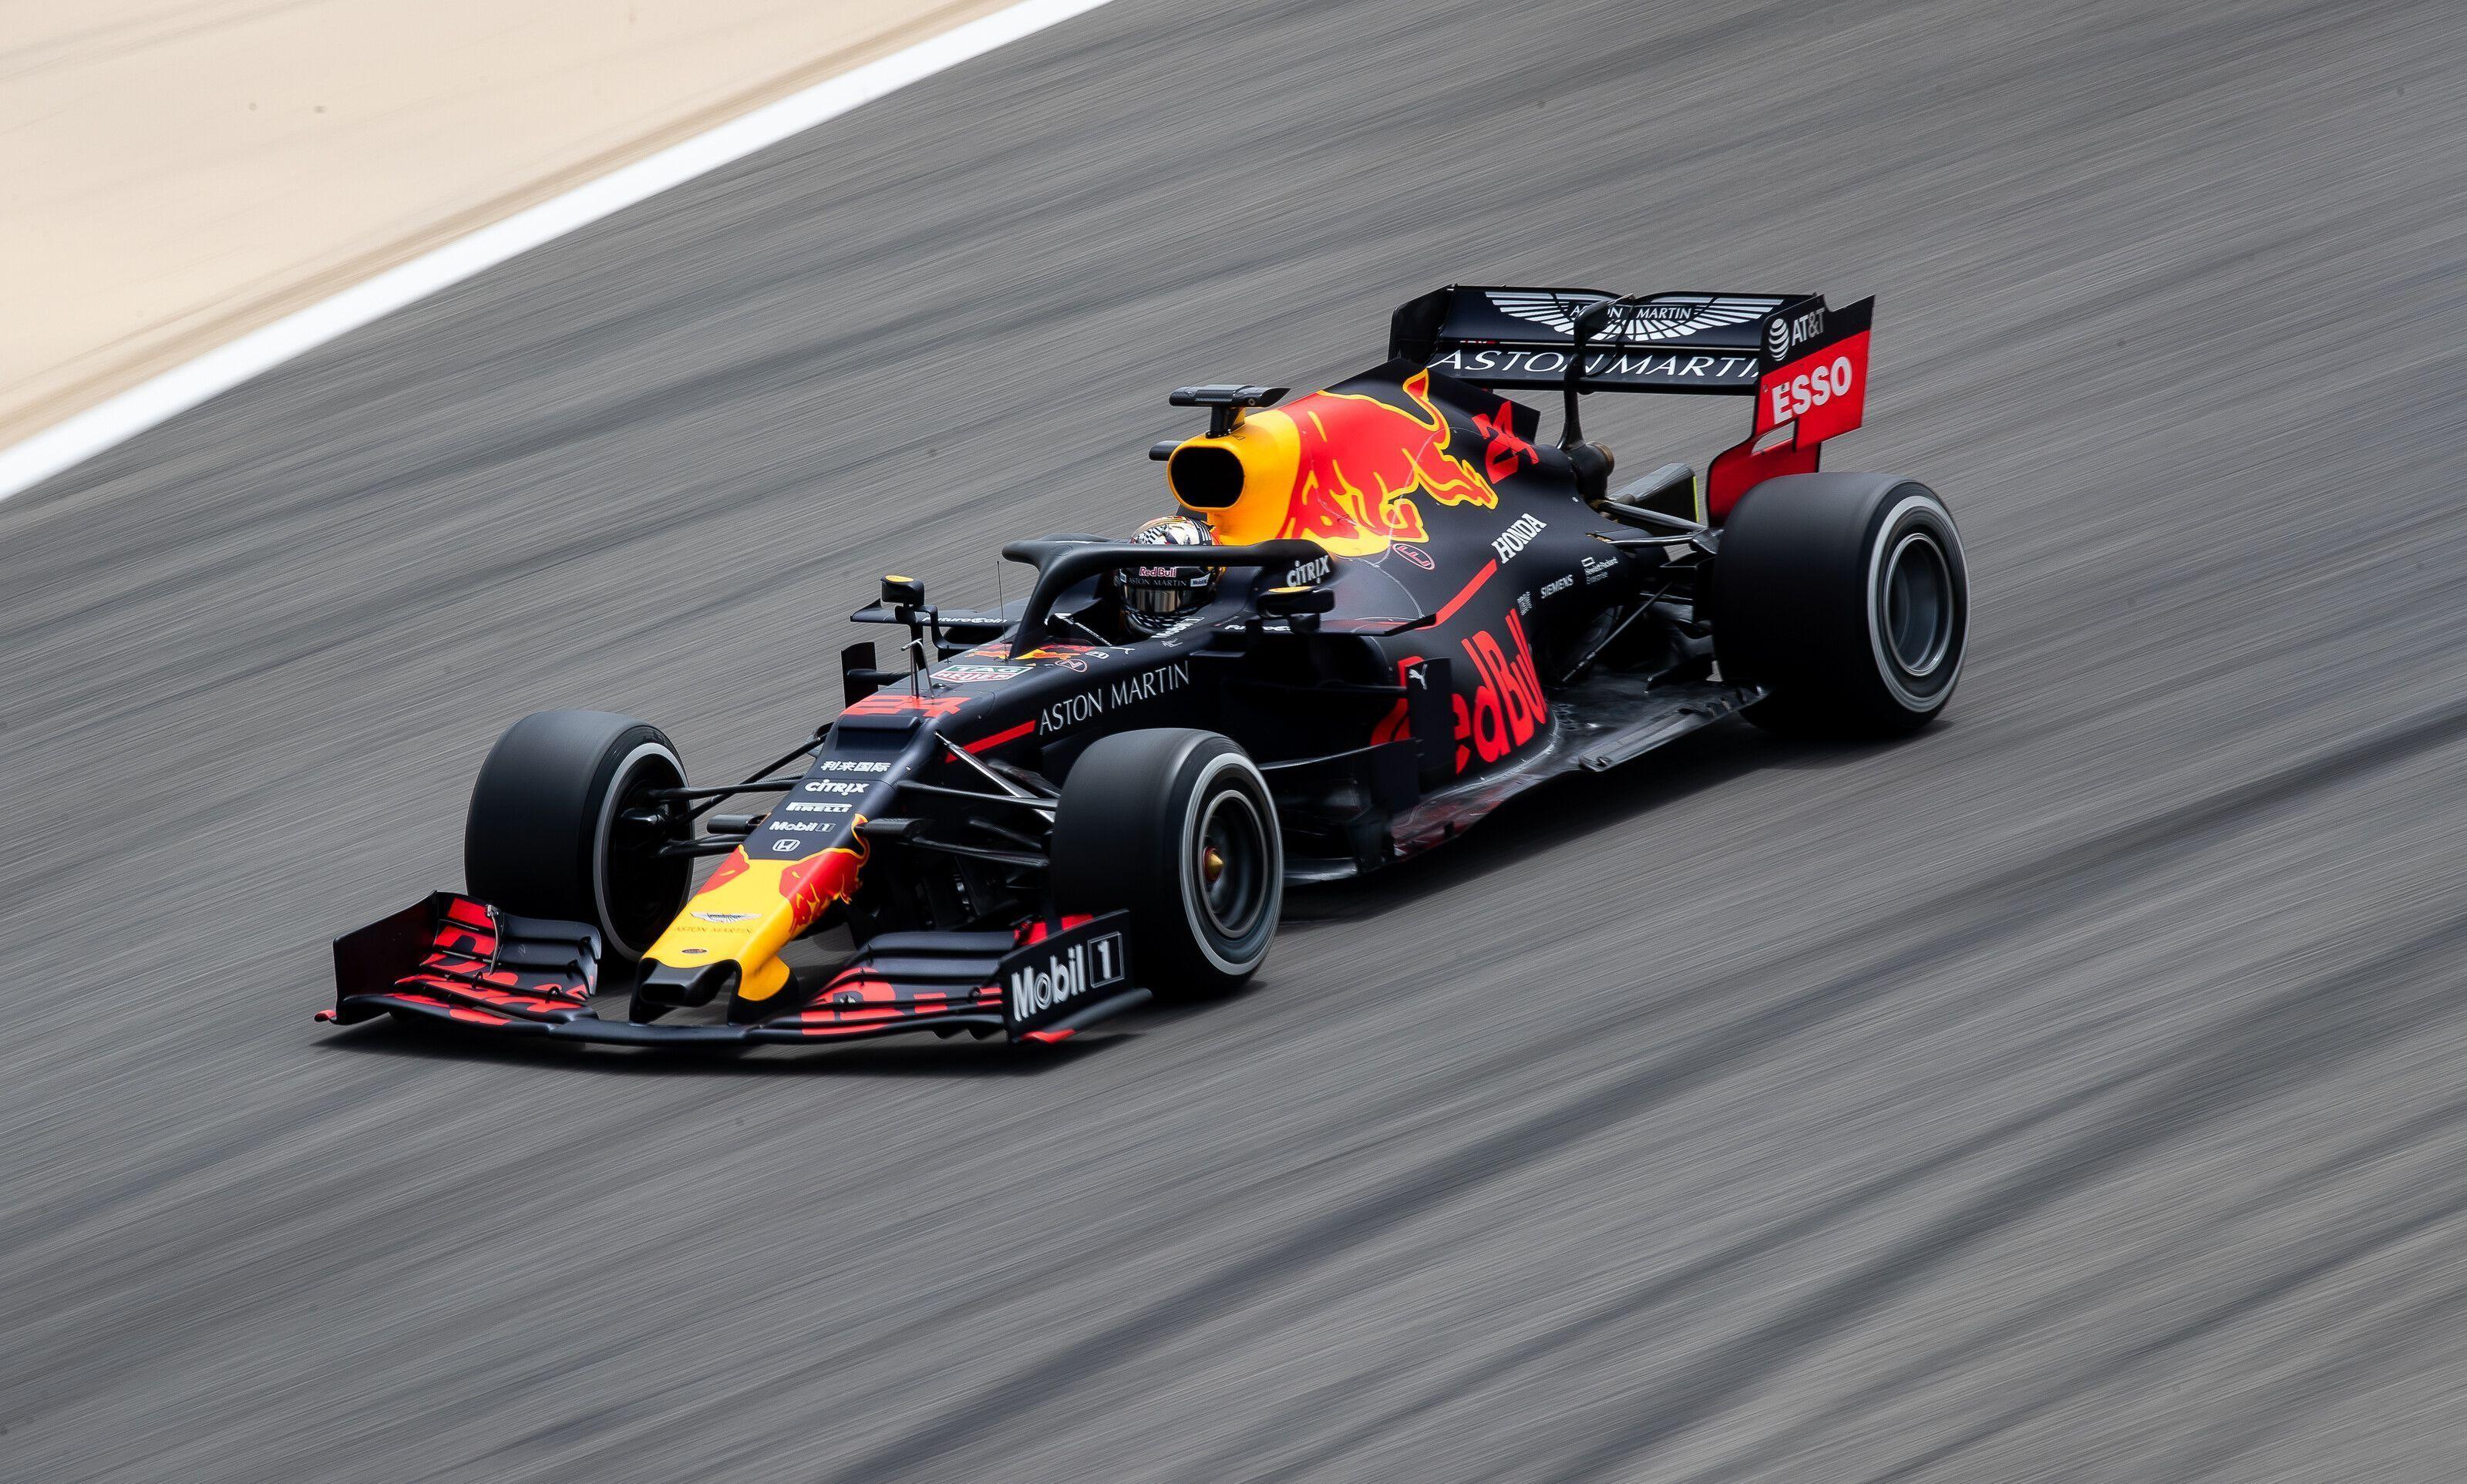 Dan Ticktum, Red Bull F1